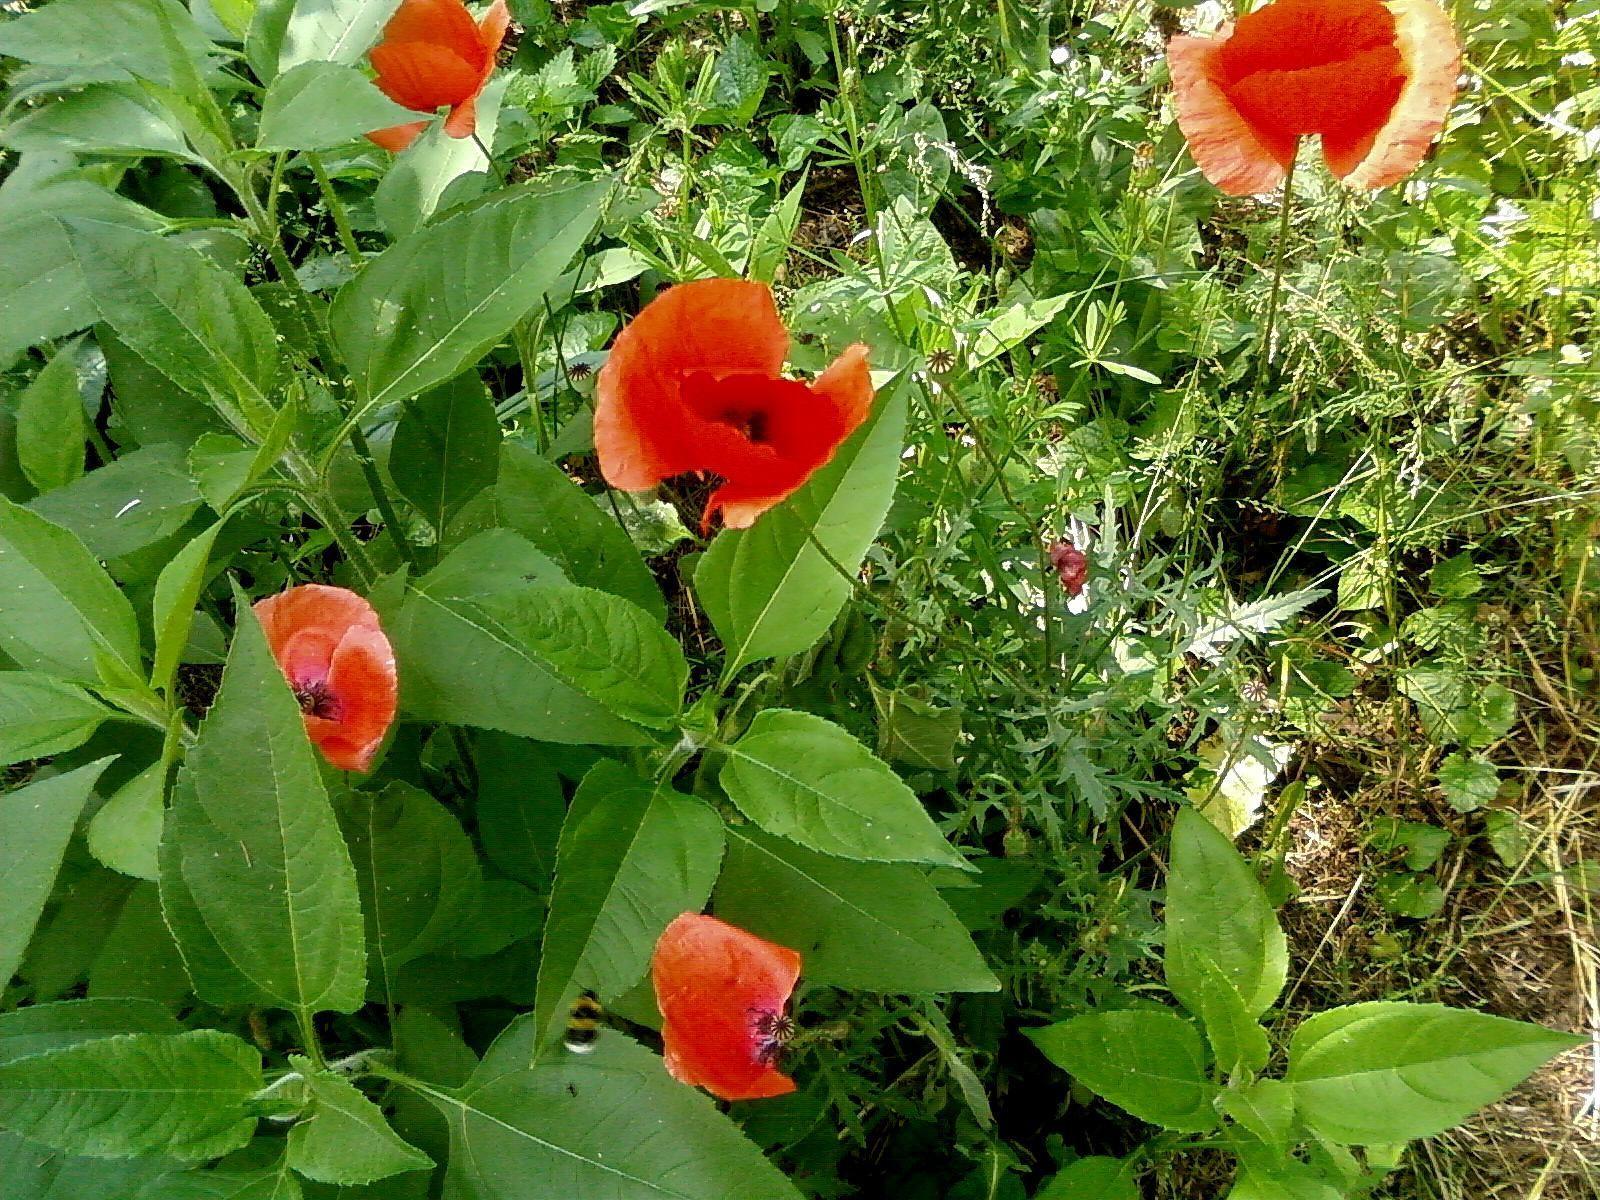 wild poppy flowers on - photo #9